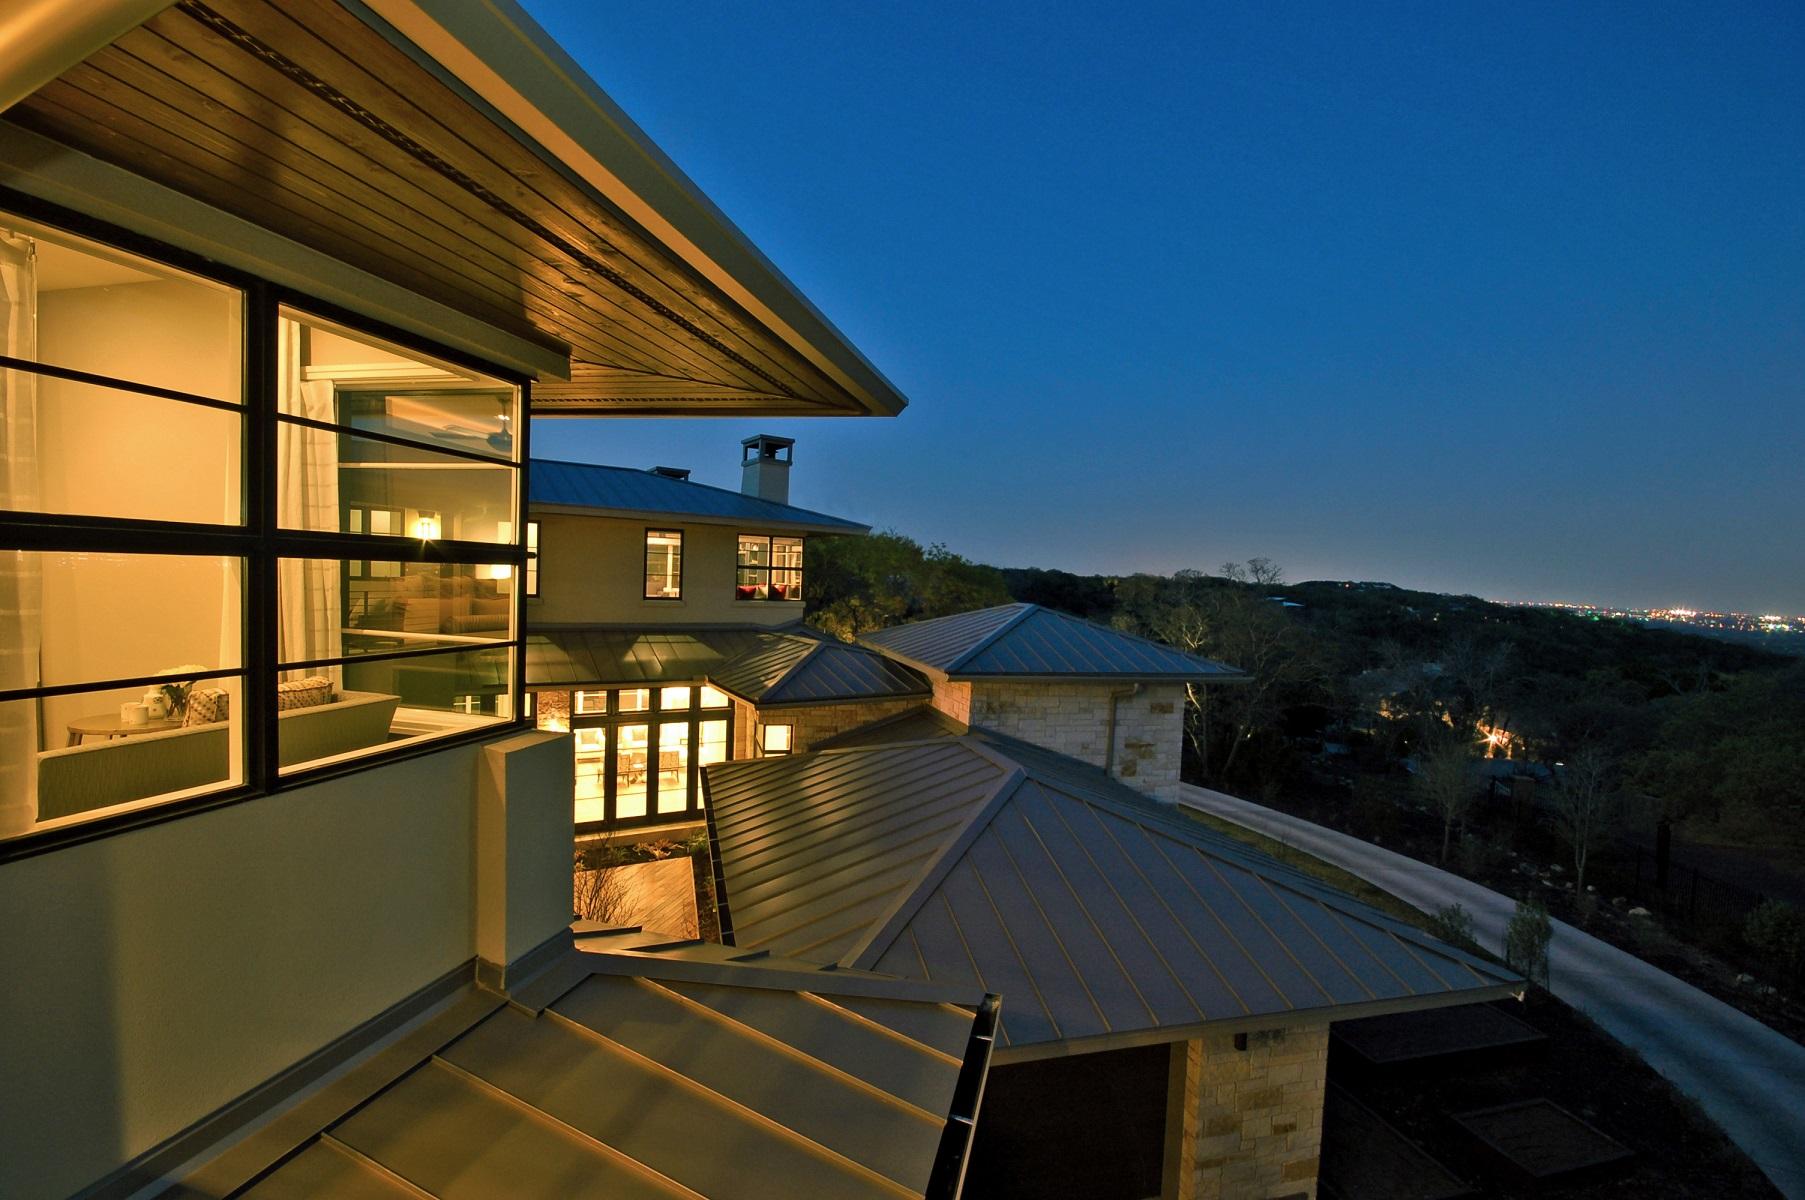 cortona-roof-angles